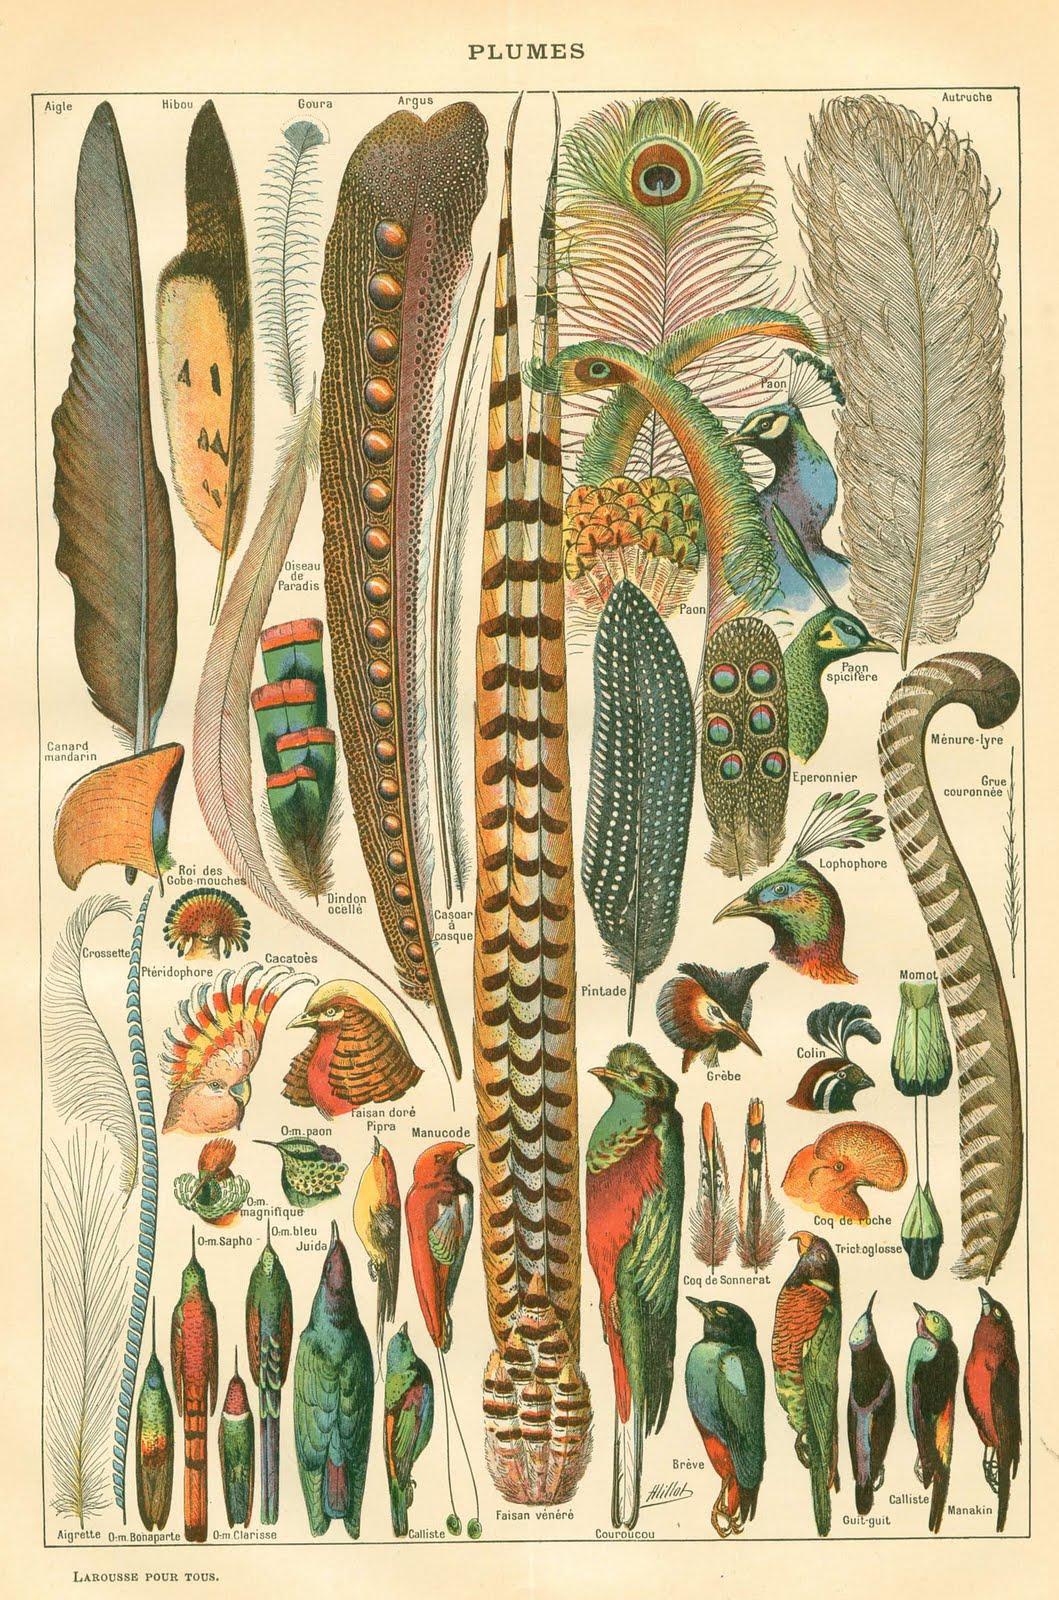 Vintage Instant Art Printable- Gorgeous Feathers - Plumes - The - Free Printable Vintage Art